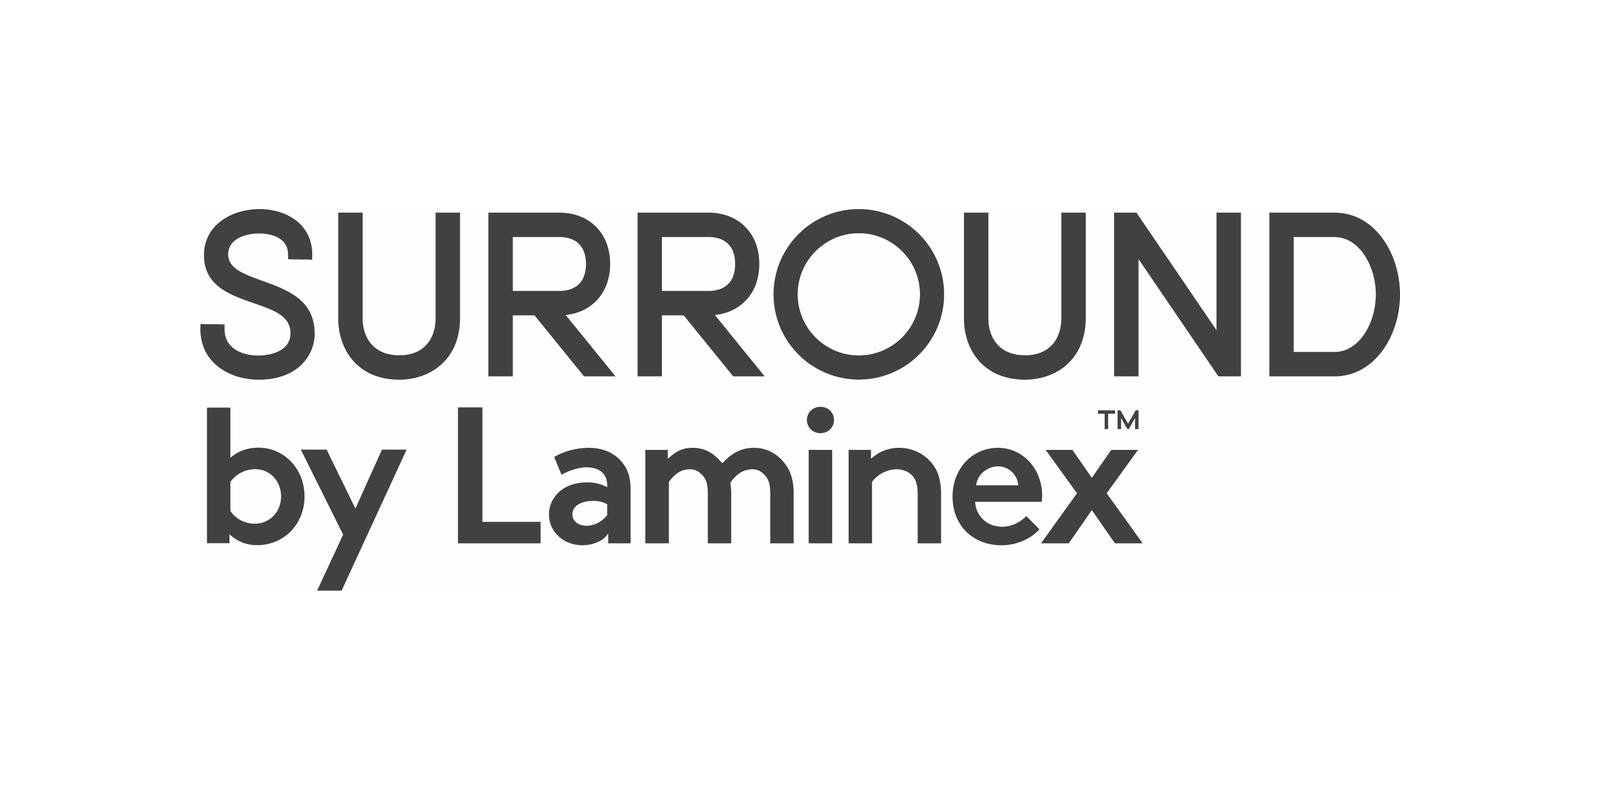 Surround by Laminex logo